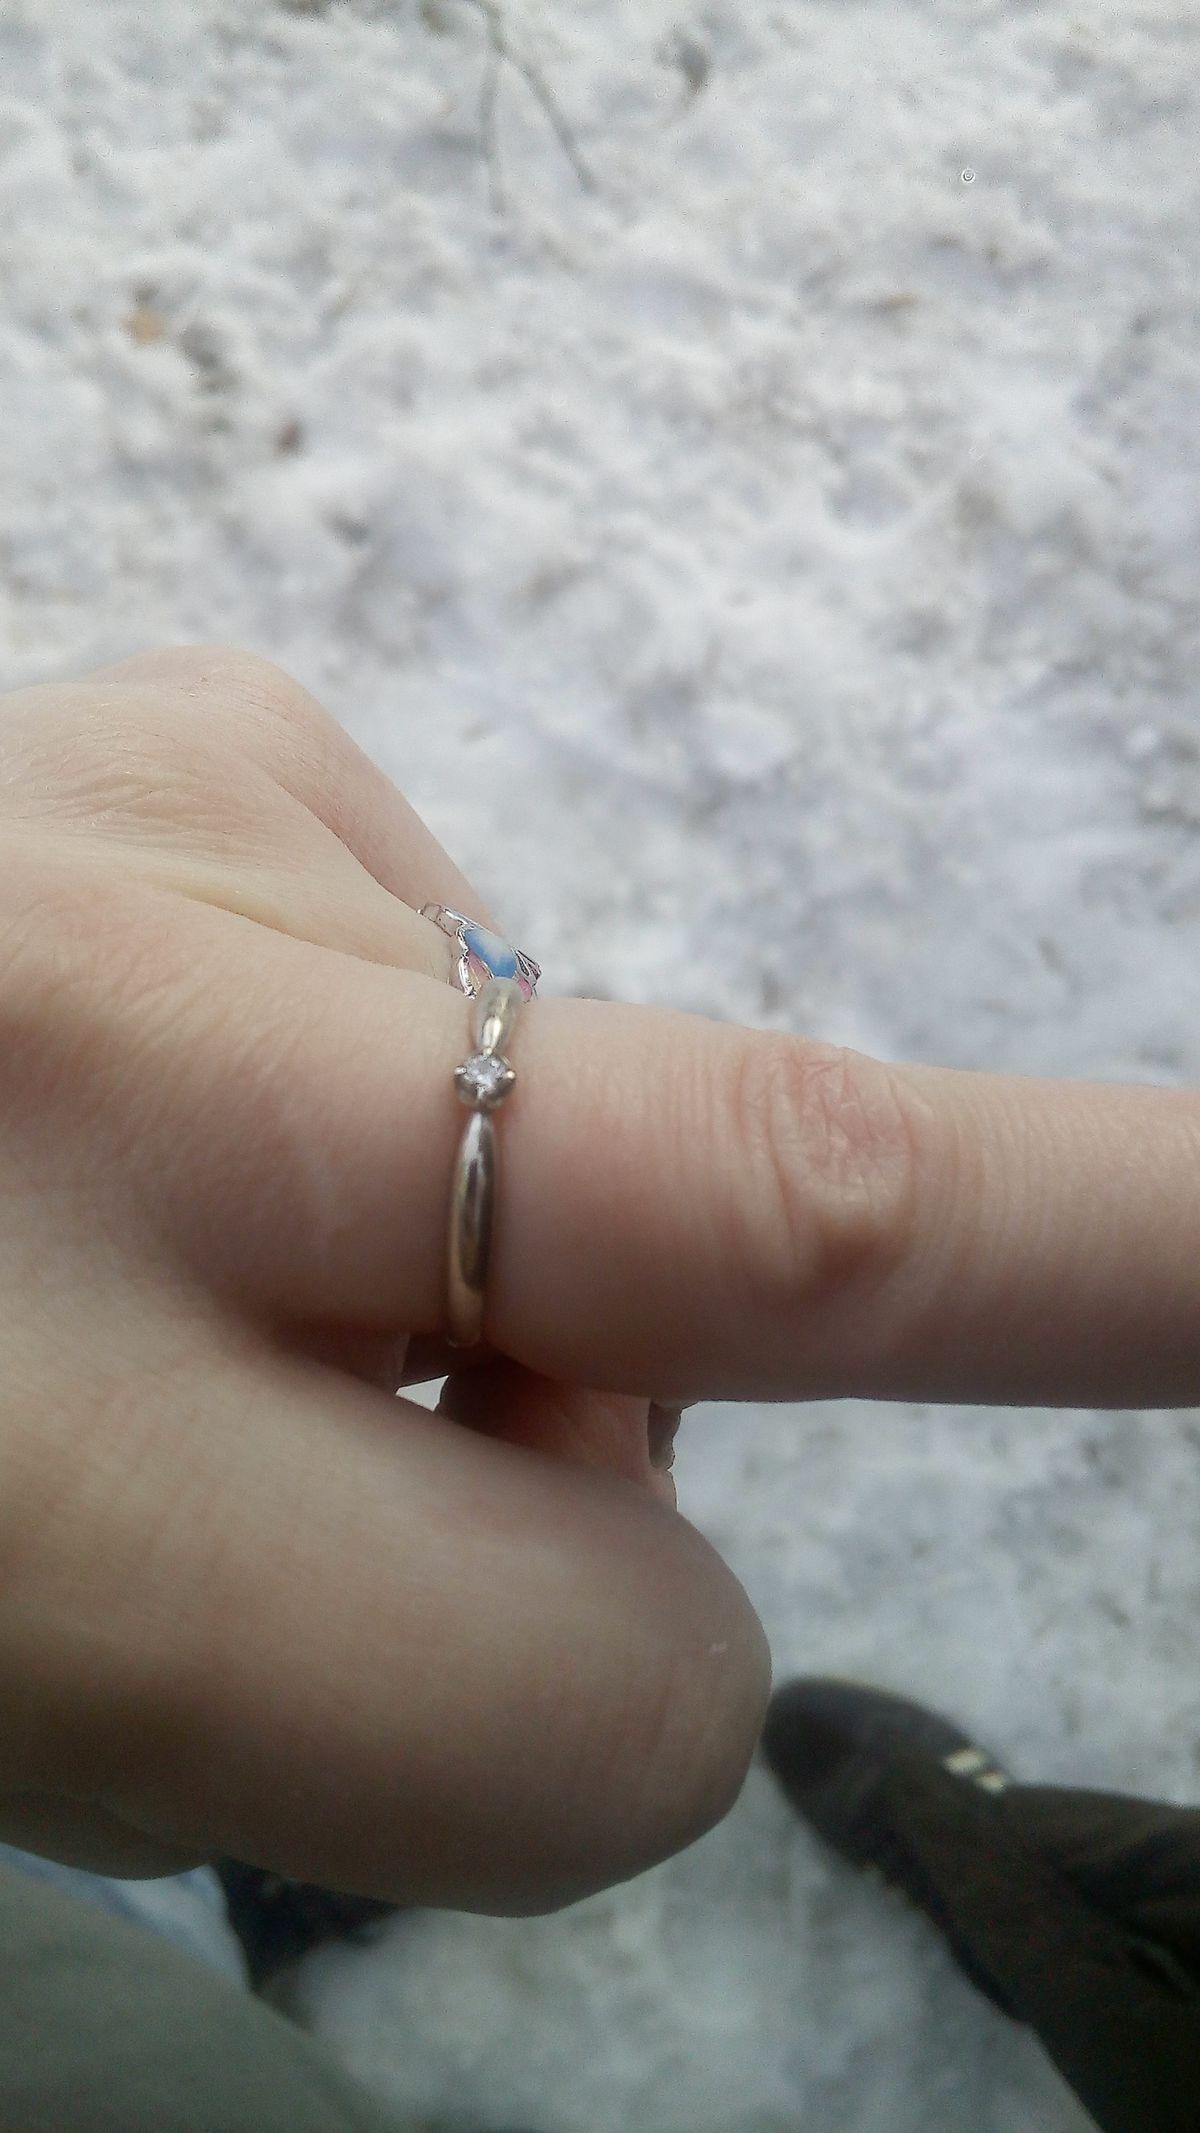 Кольцо с камешком